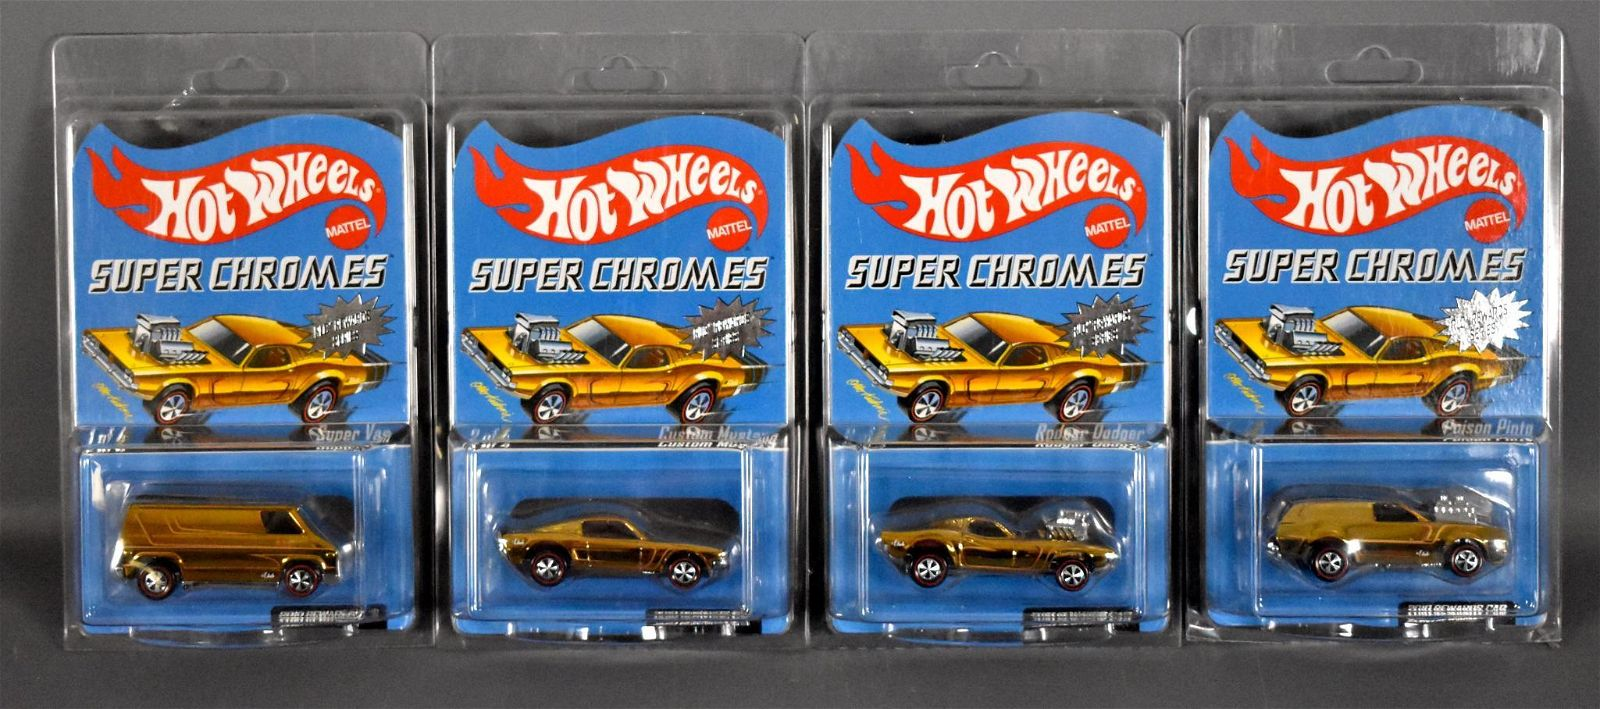 Hot Wheels Redline Club Super Chromes 2011 rewards set